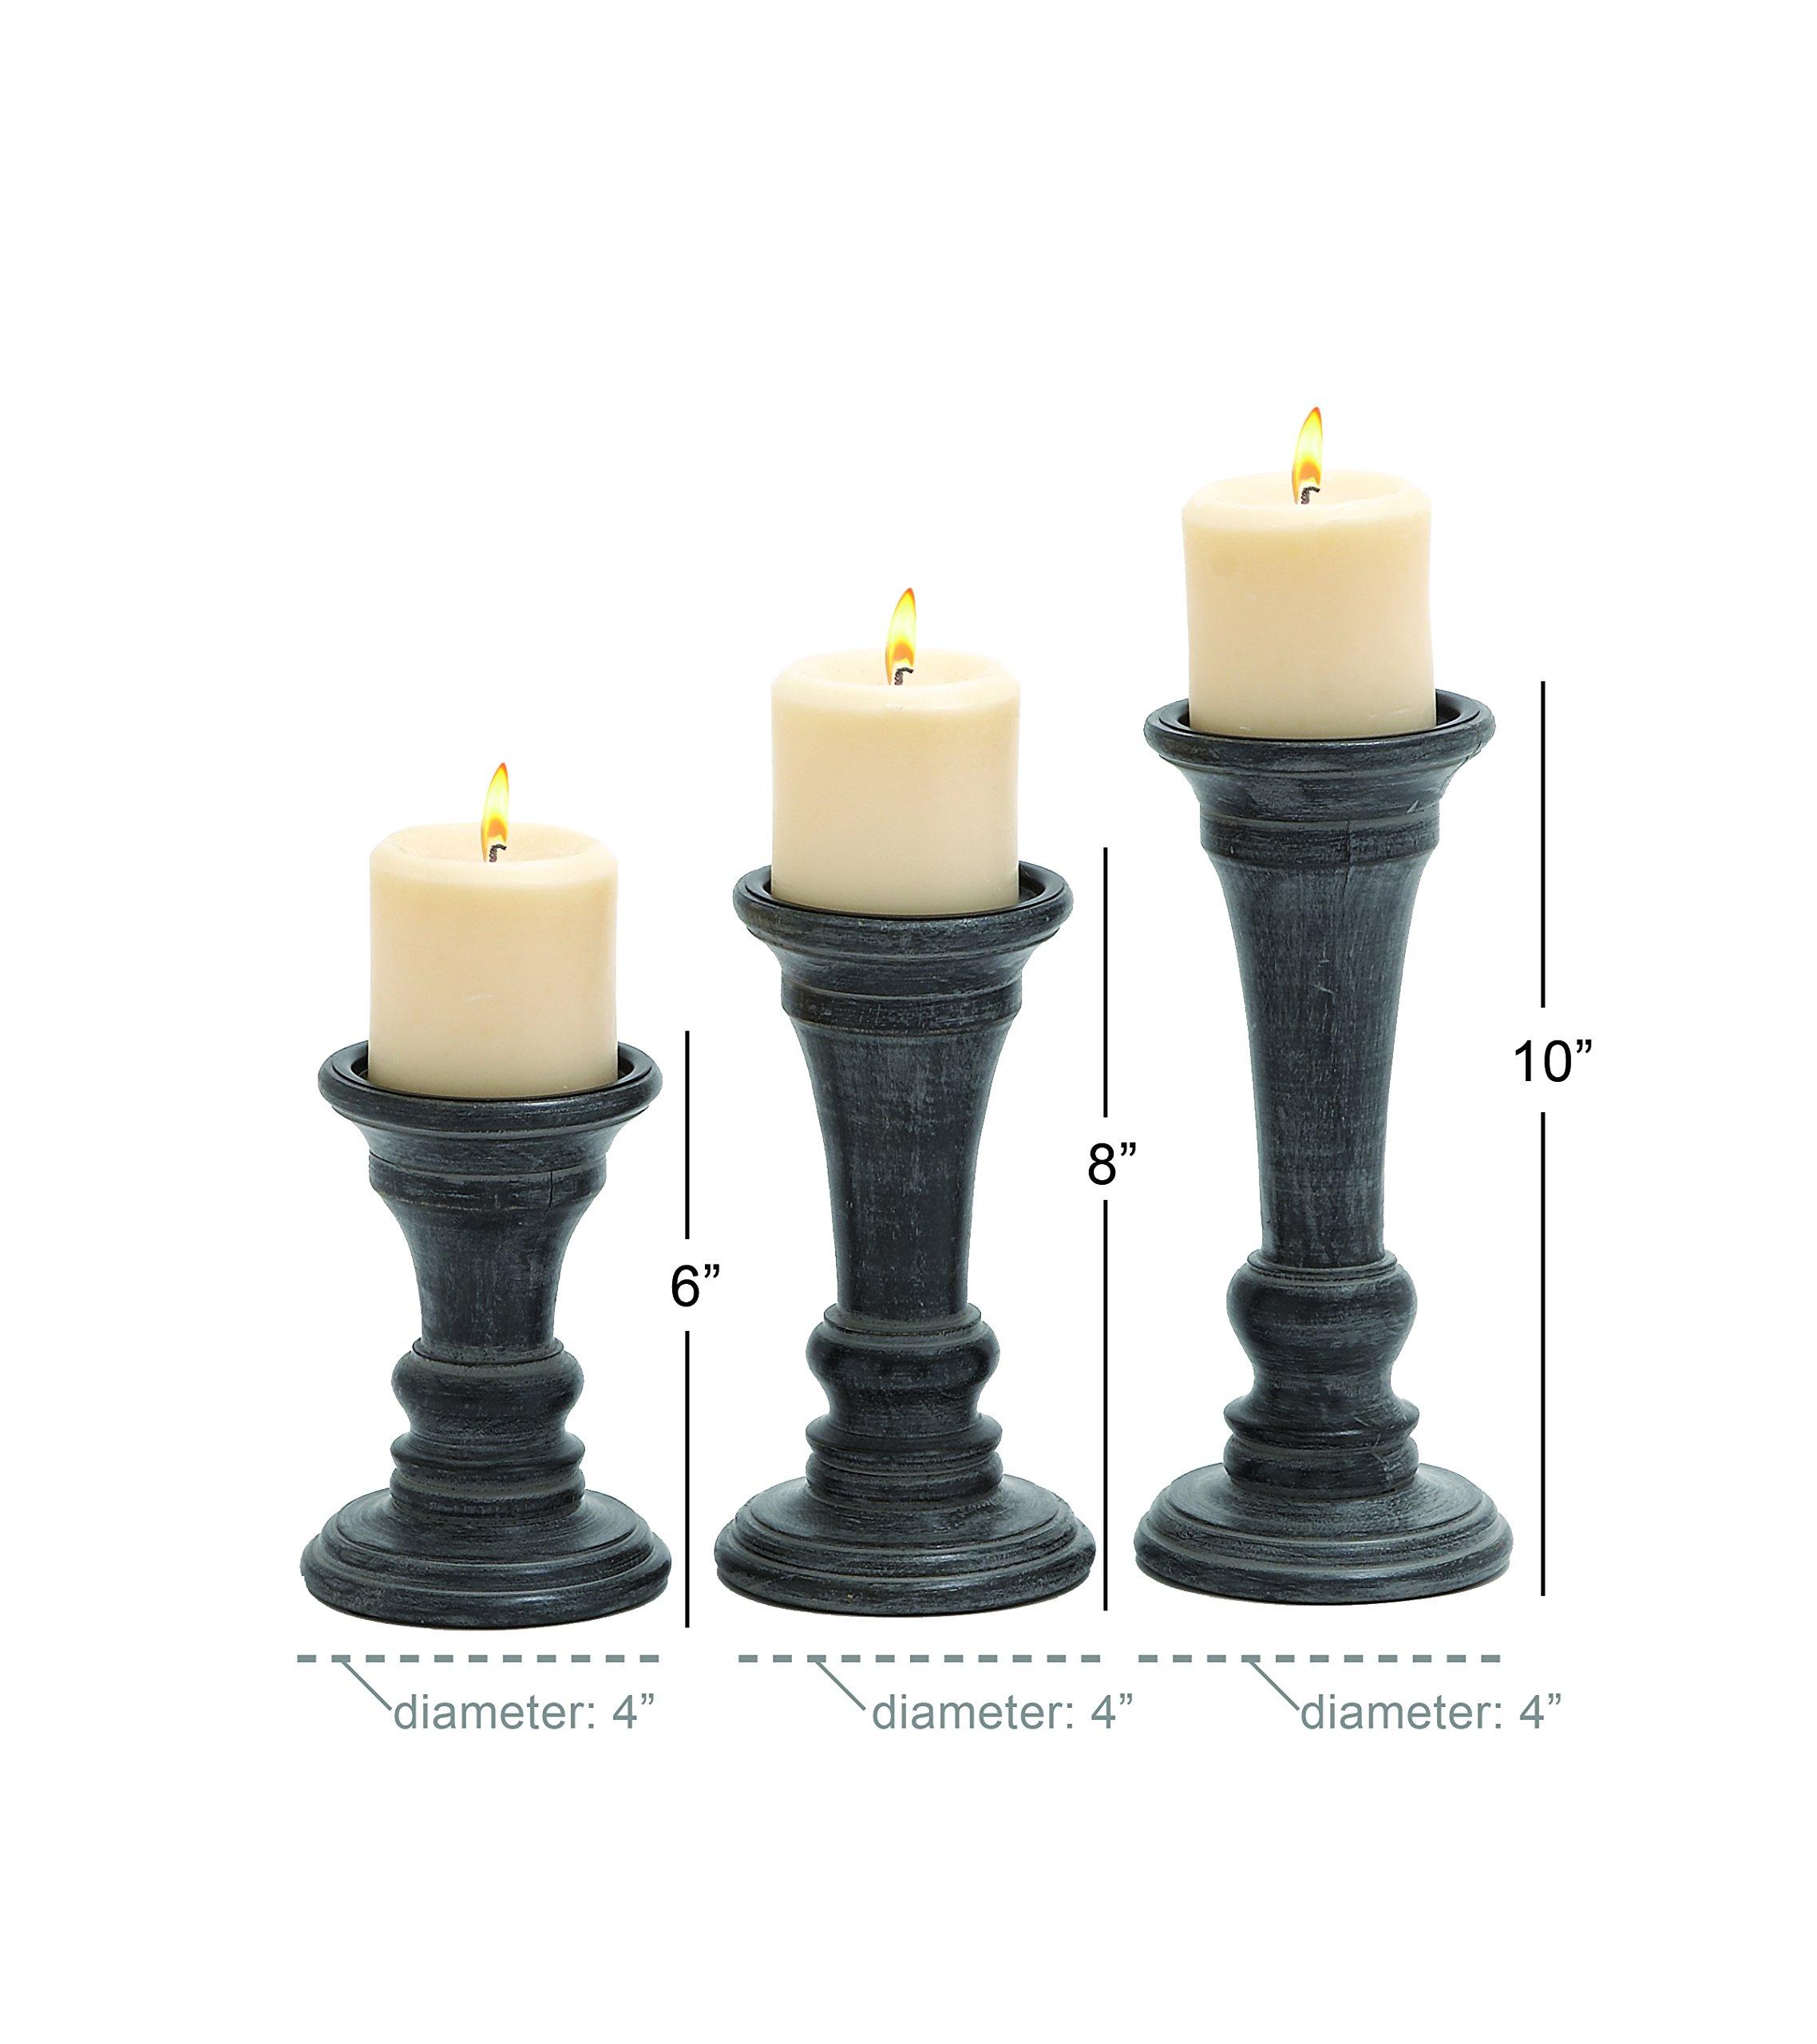 Candlestick Holder Vintage Wooden Dark Stained Candlestick Holder Wooden Candlestick Holder